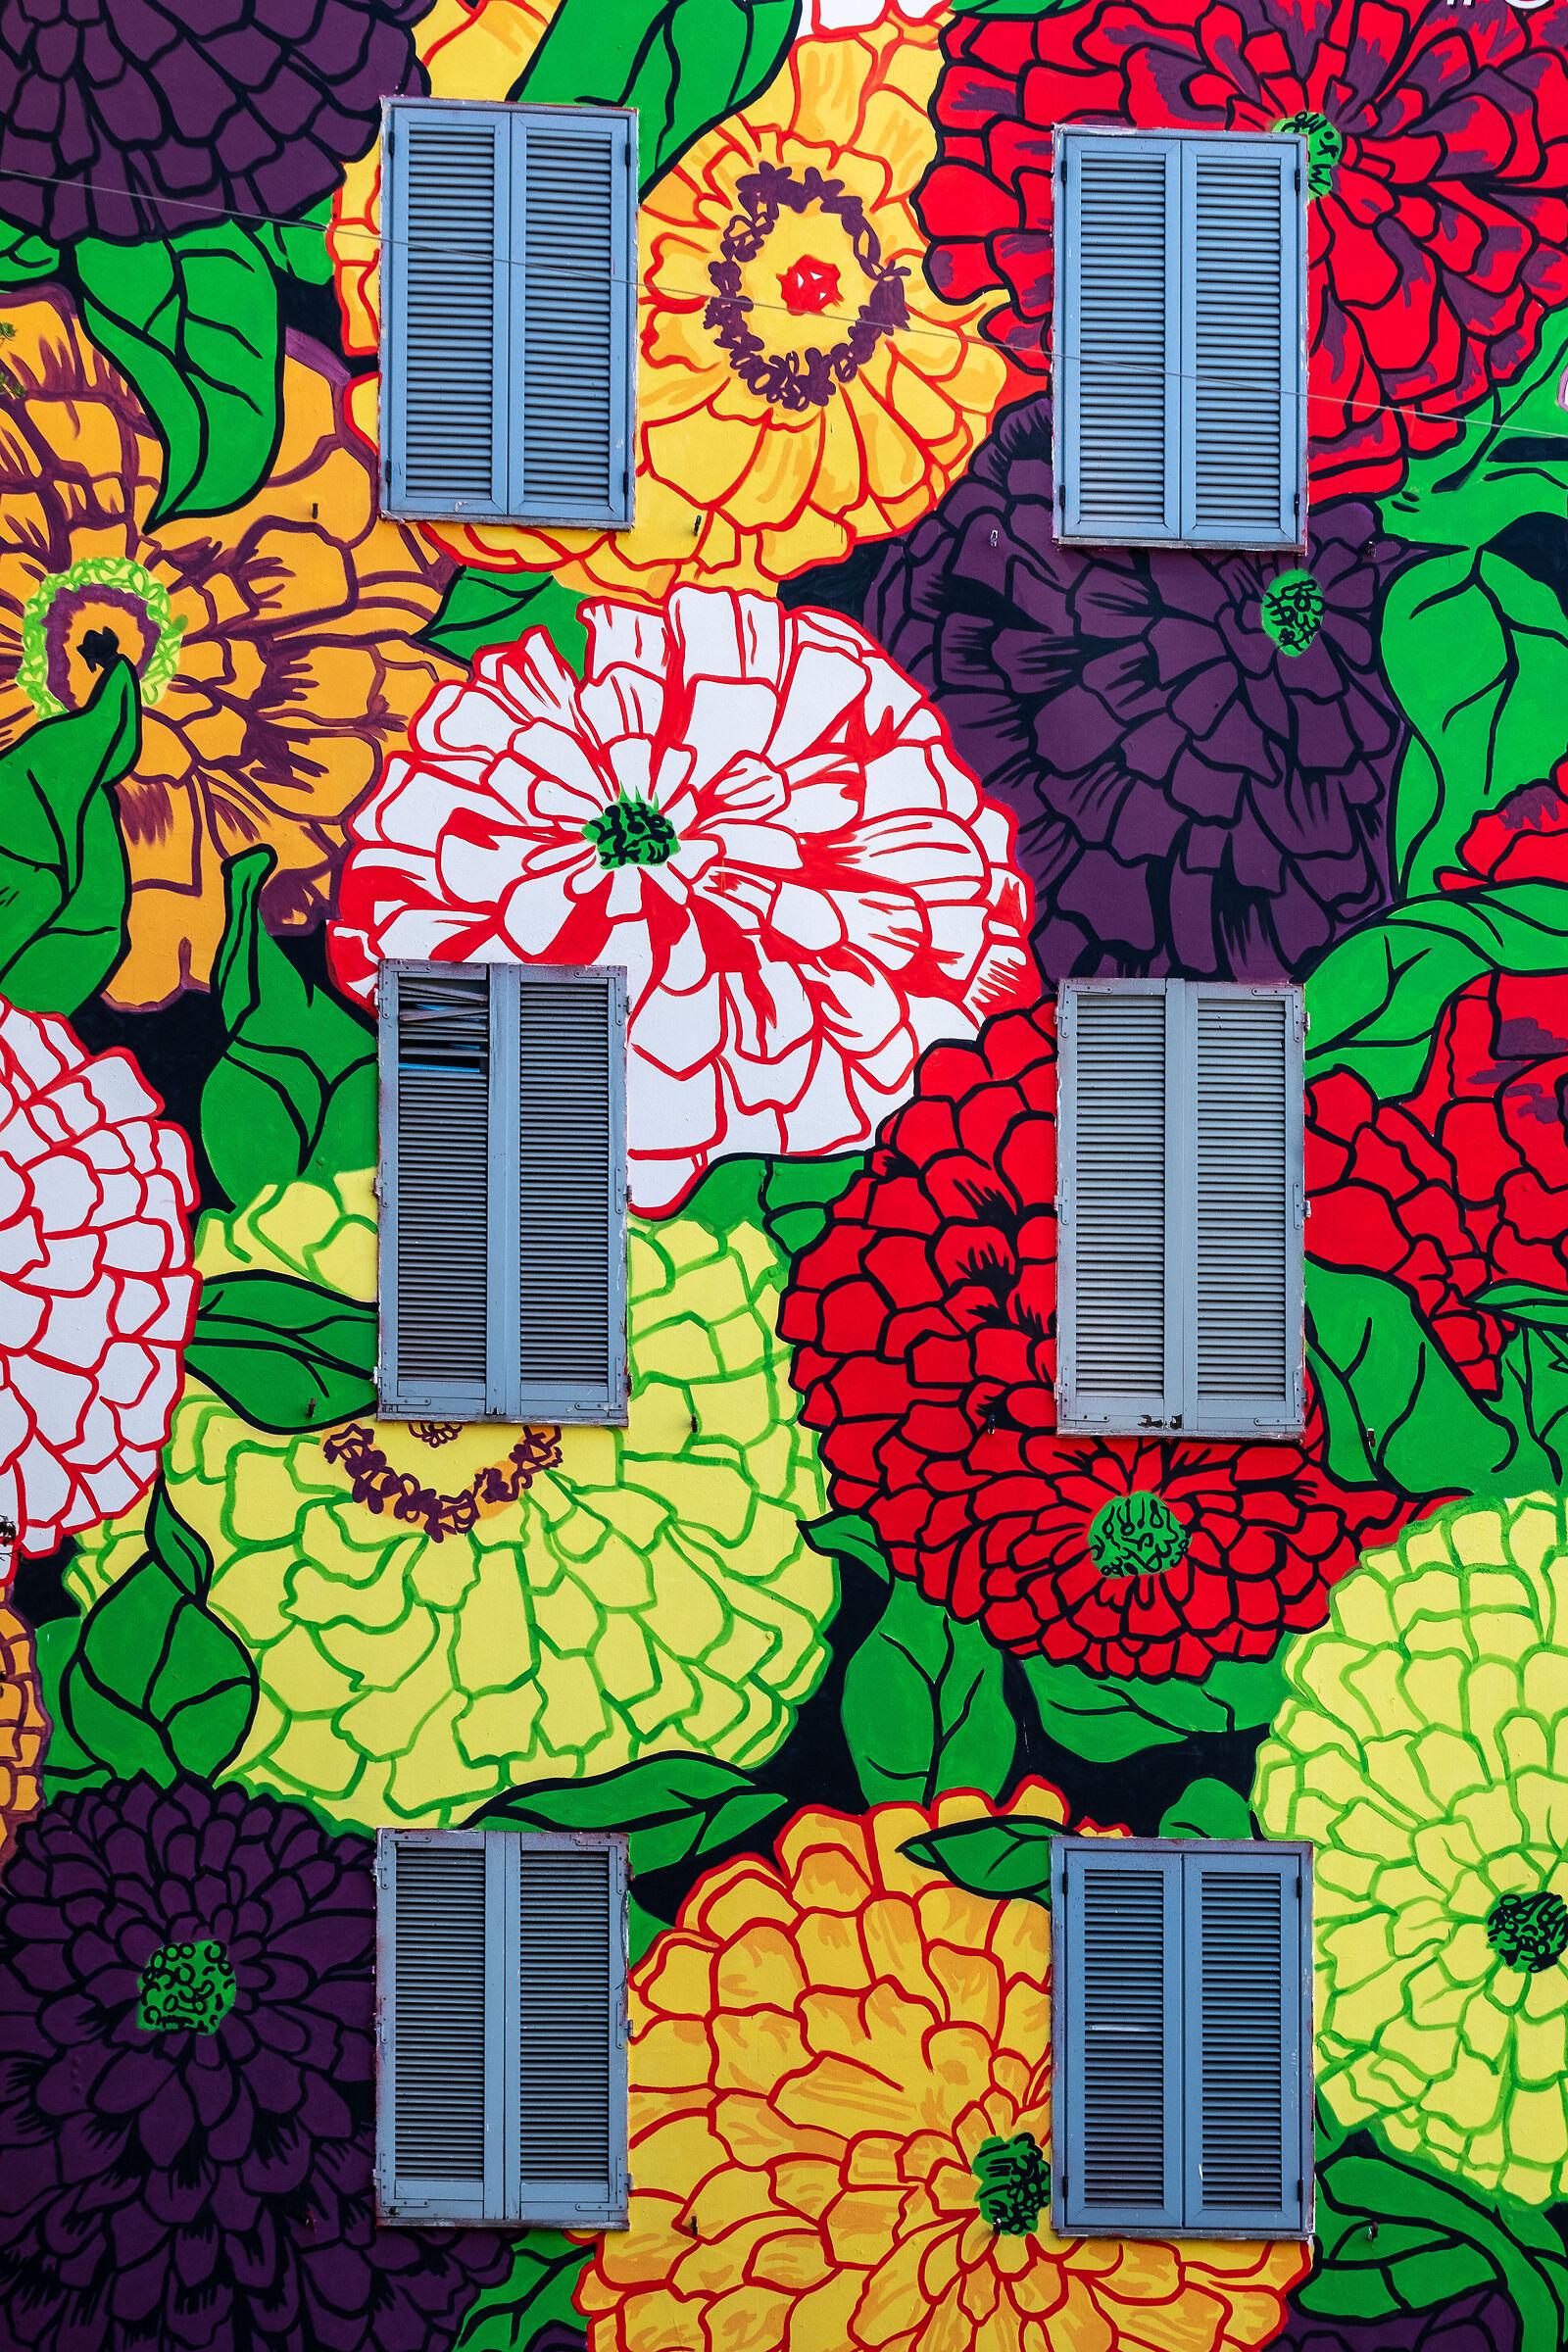 Gucci murals...